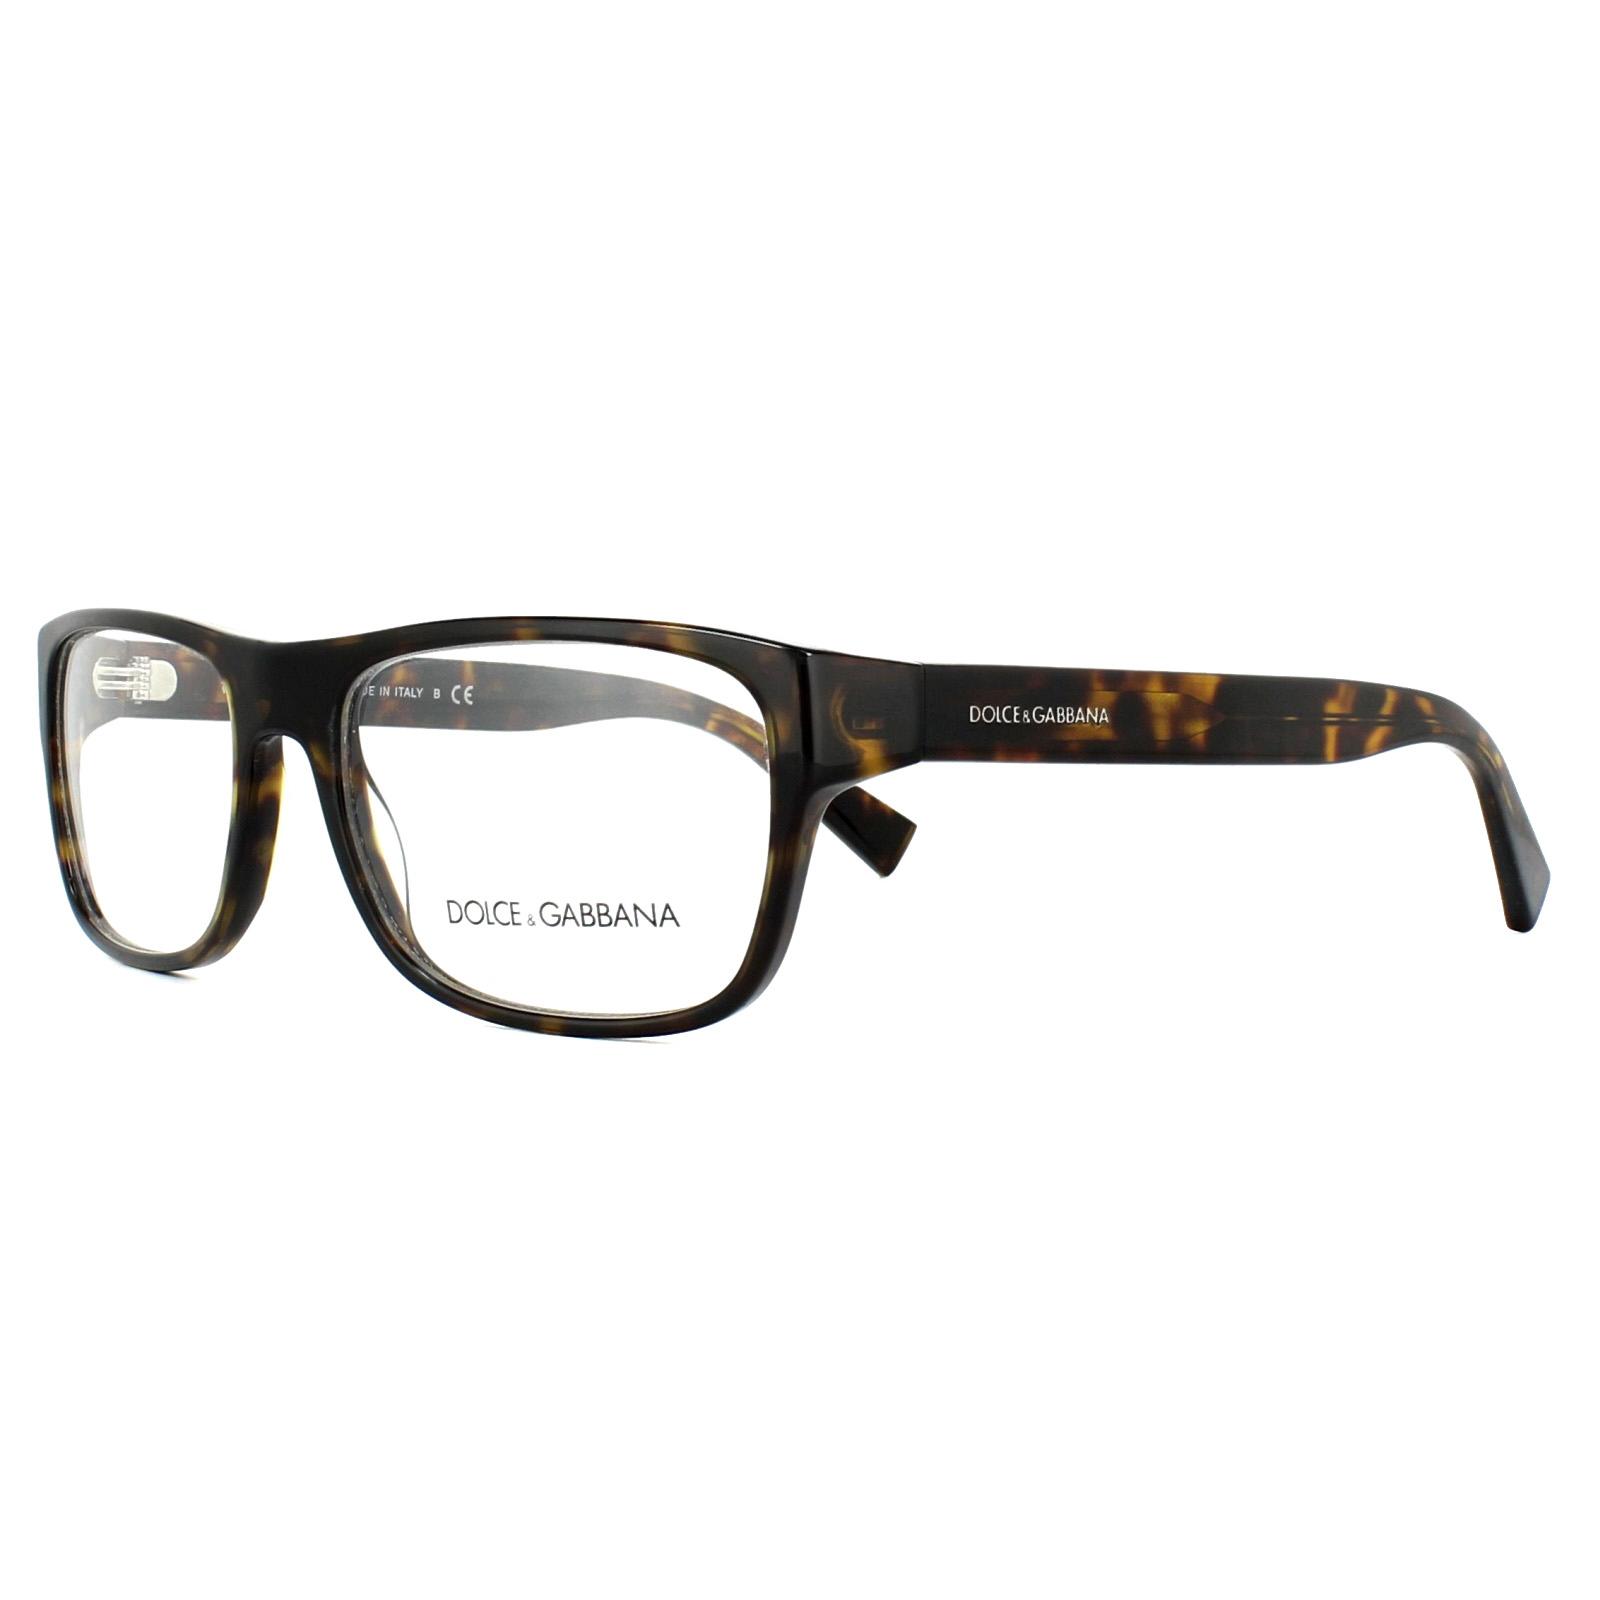 3c61f8fdc1fd Details about Dolce   Gabbana Glasses Frames DG 3276 502 Havana 52mm Mens